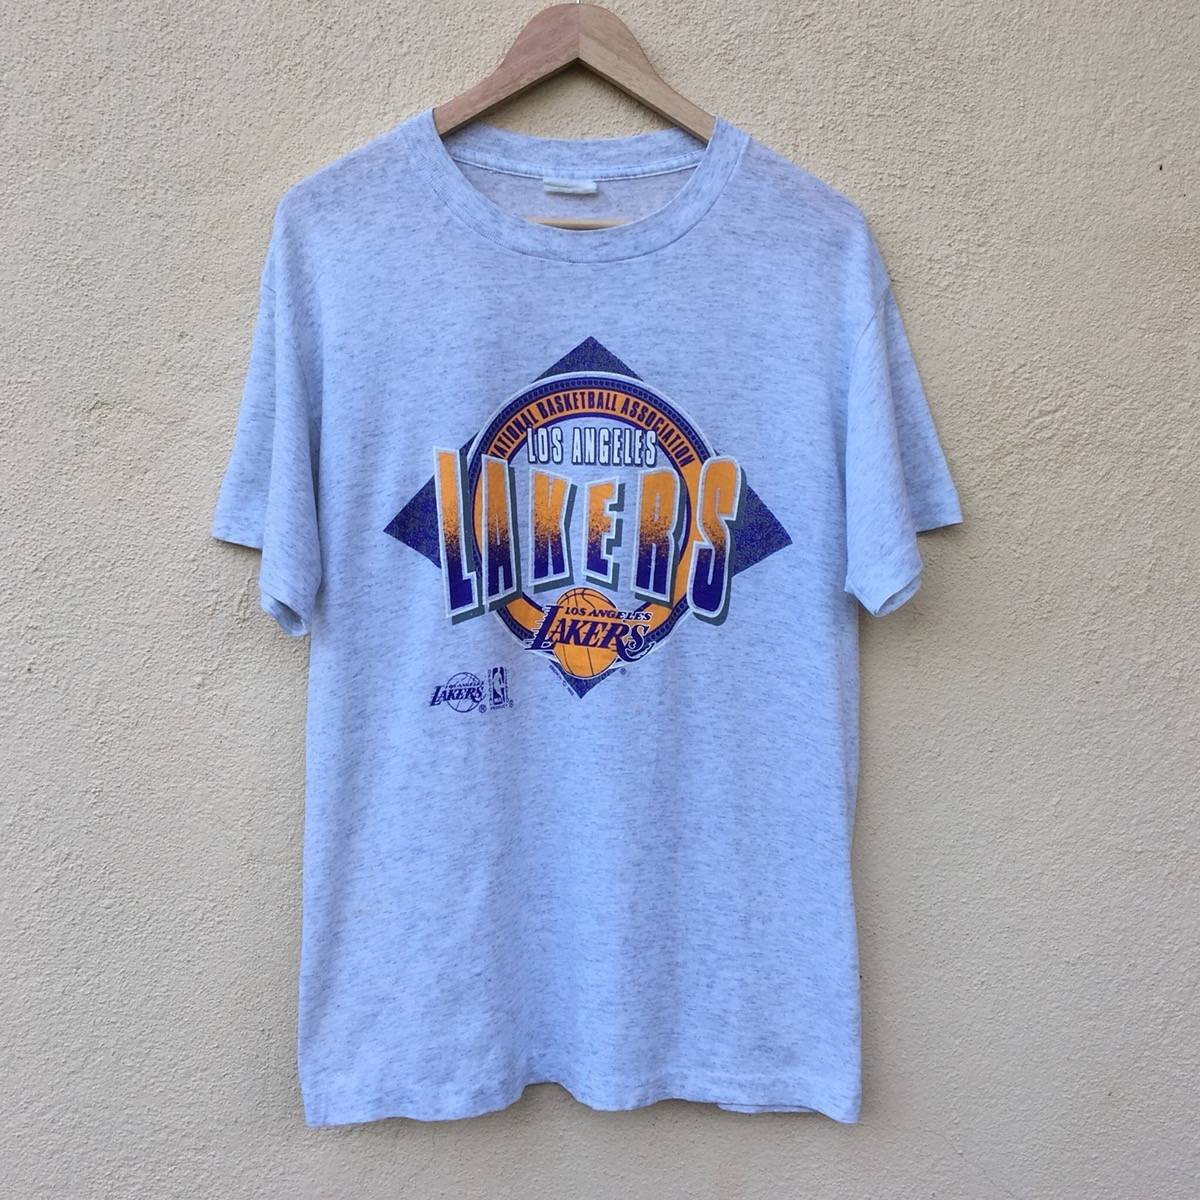 67ca53eea Vintage × Nba × L.A. Lakers ×. Vintage 90 s LA Lakers T-Shirt